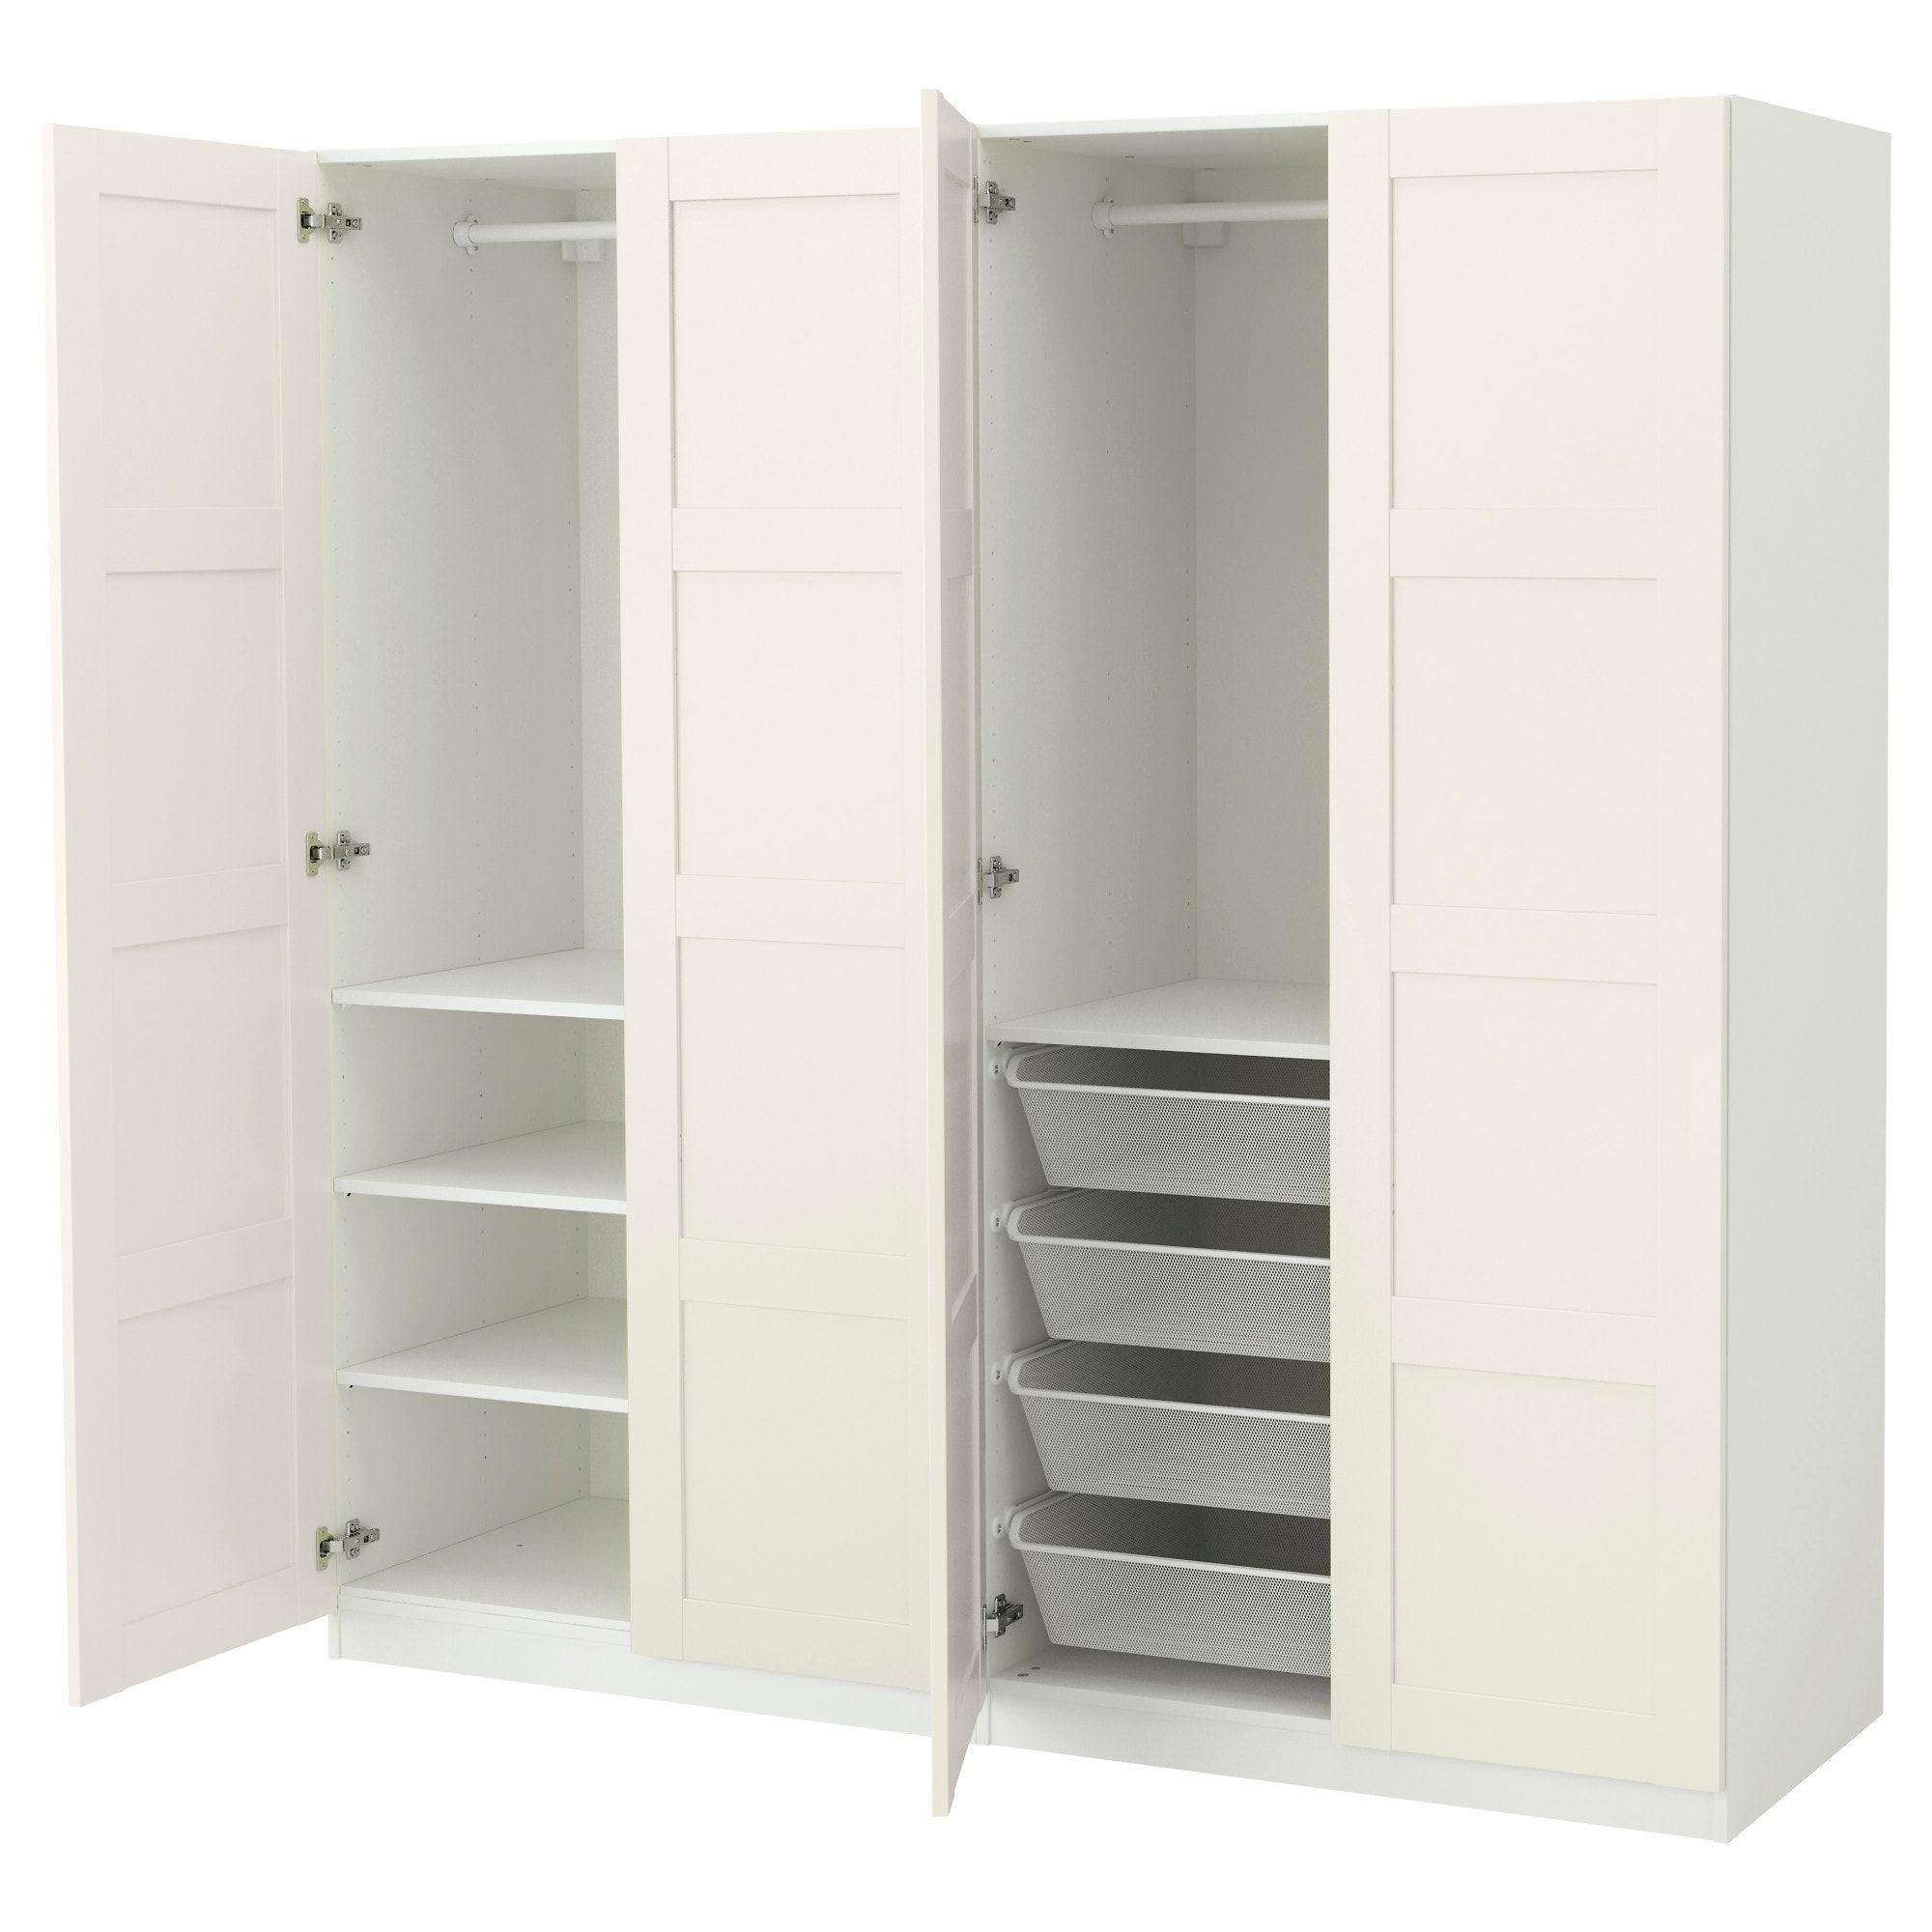 Wardrobe, white, Bergsbo white, 78 3/4x23 5/8x79 1/4